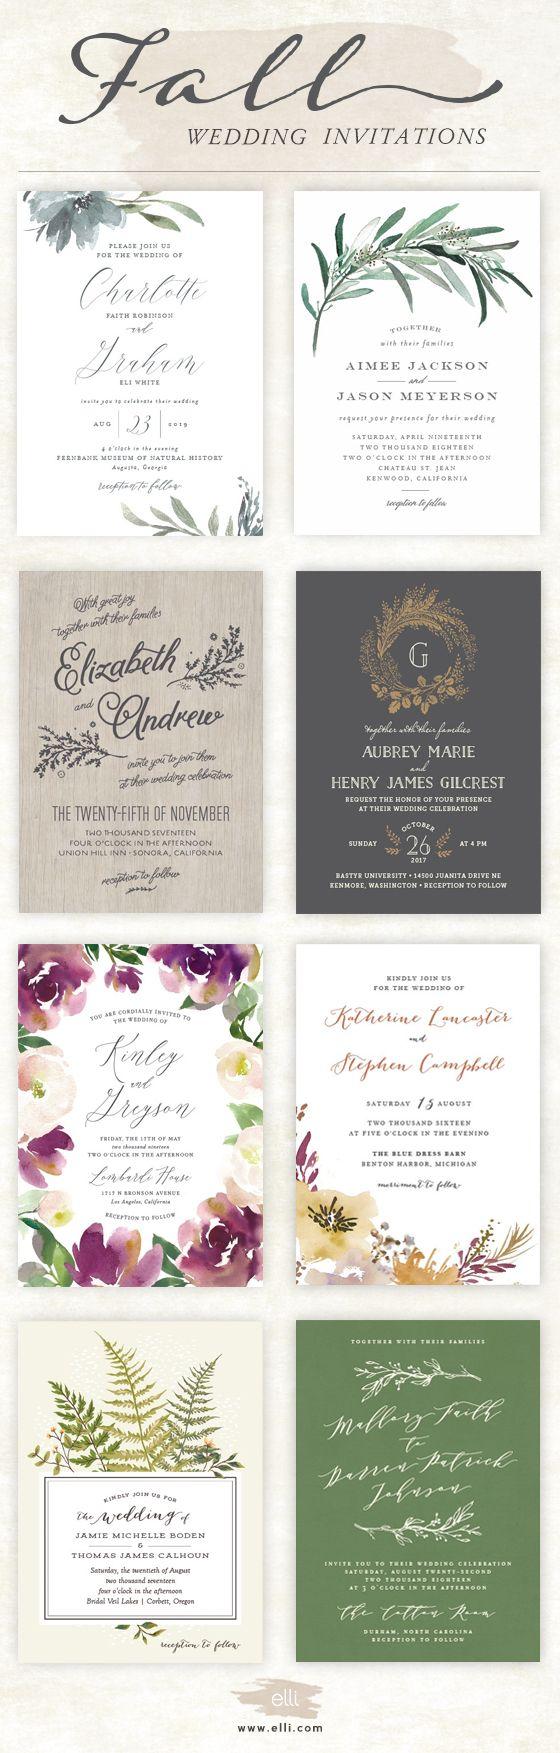 Top Wedding Invitations For Fall Weddings!